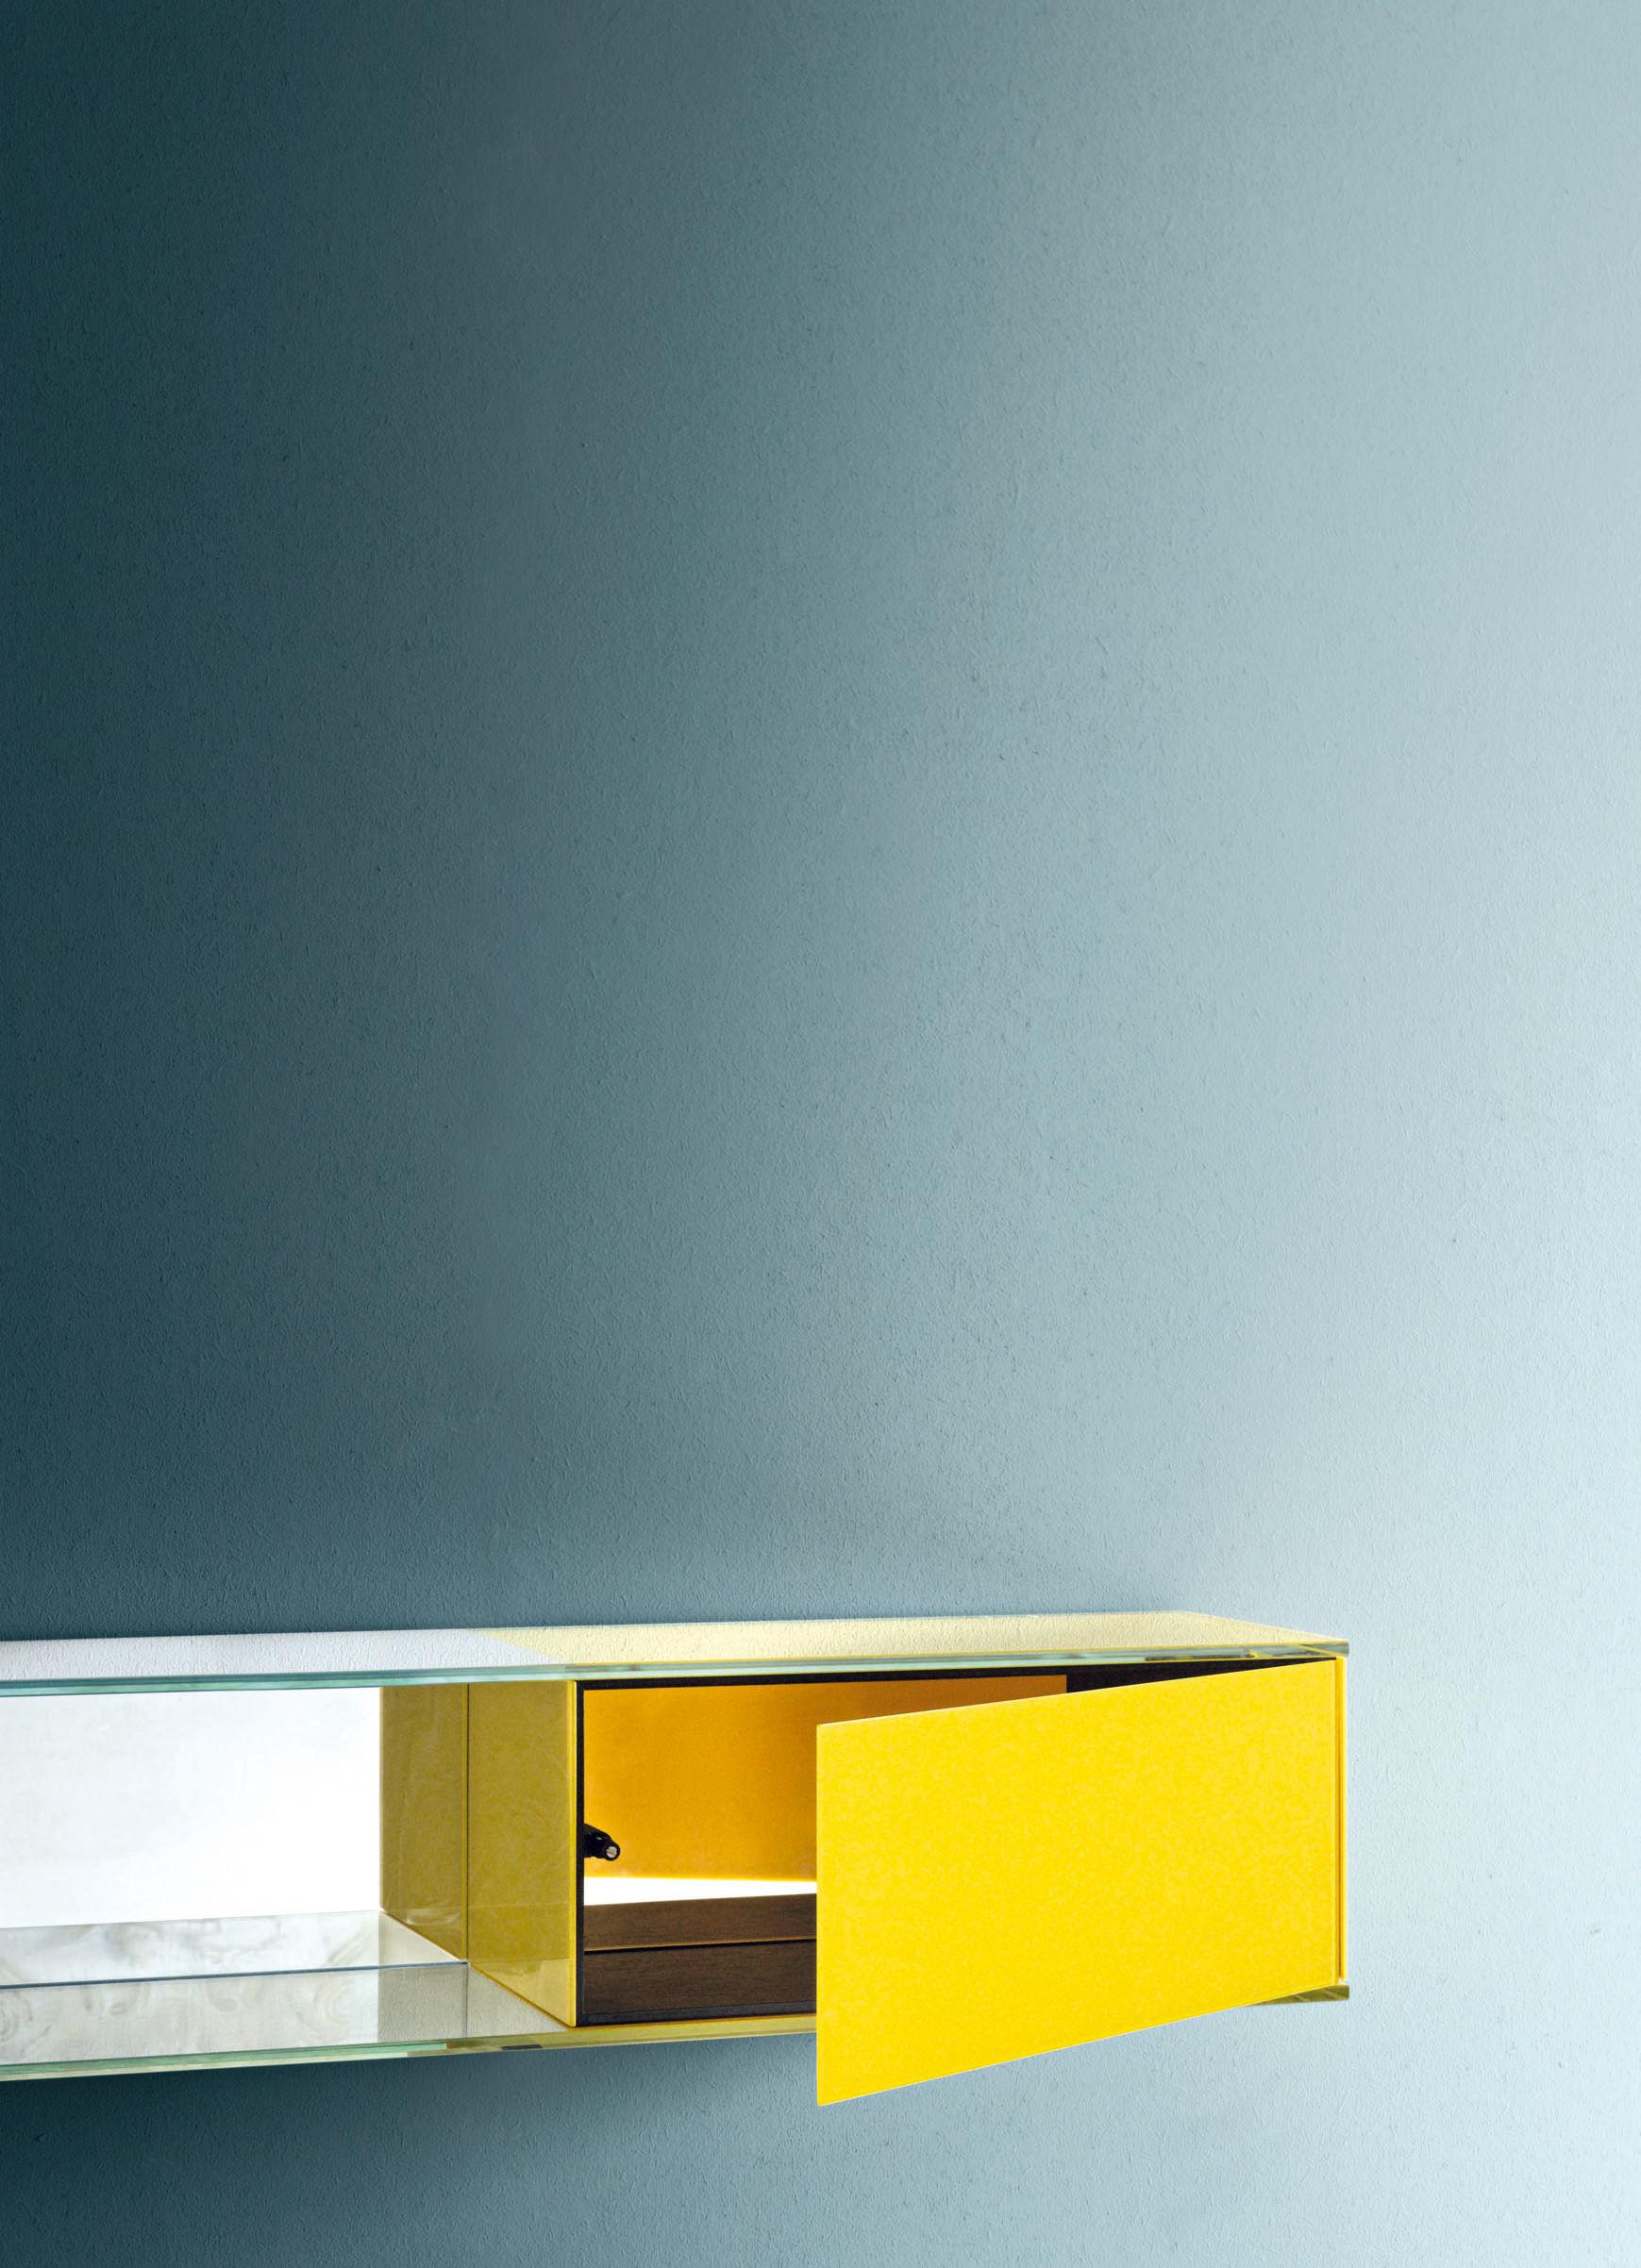 etag re float wall 4 l 130 x h 22 cm jaune glas italia. Black Bedroom Furniture Sets. Home Design Ideas